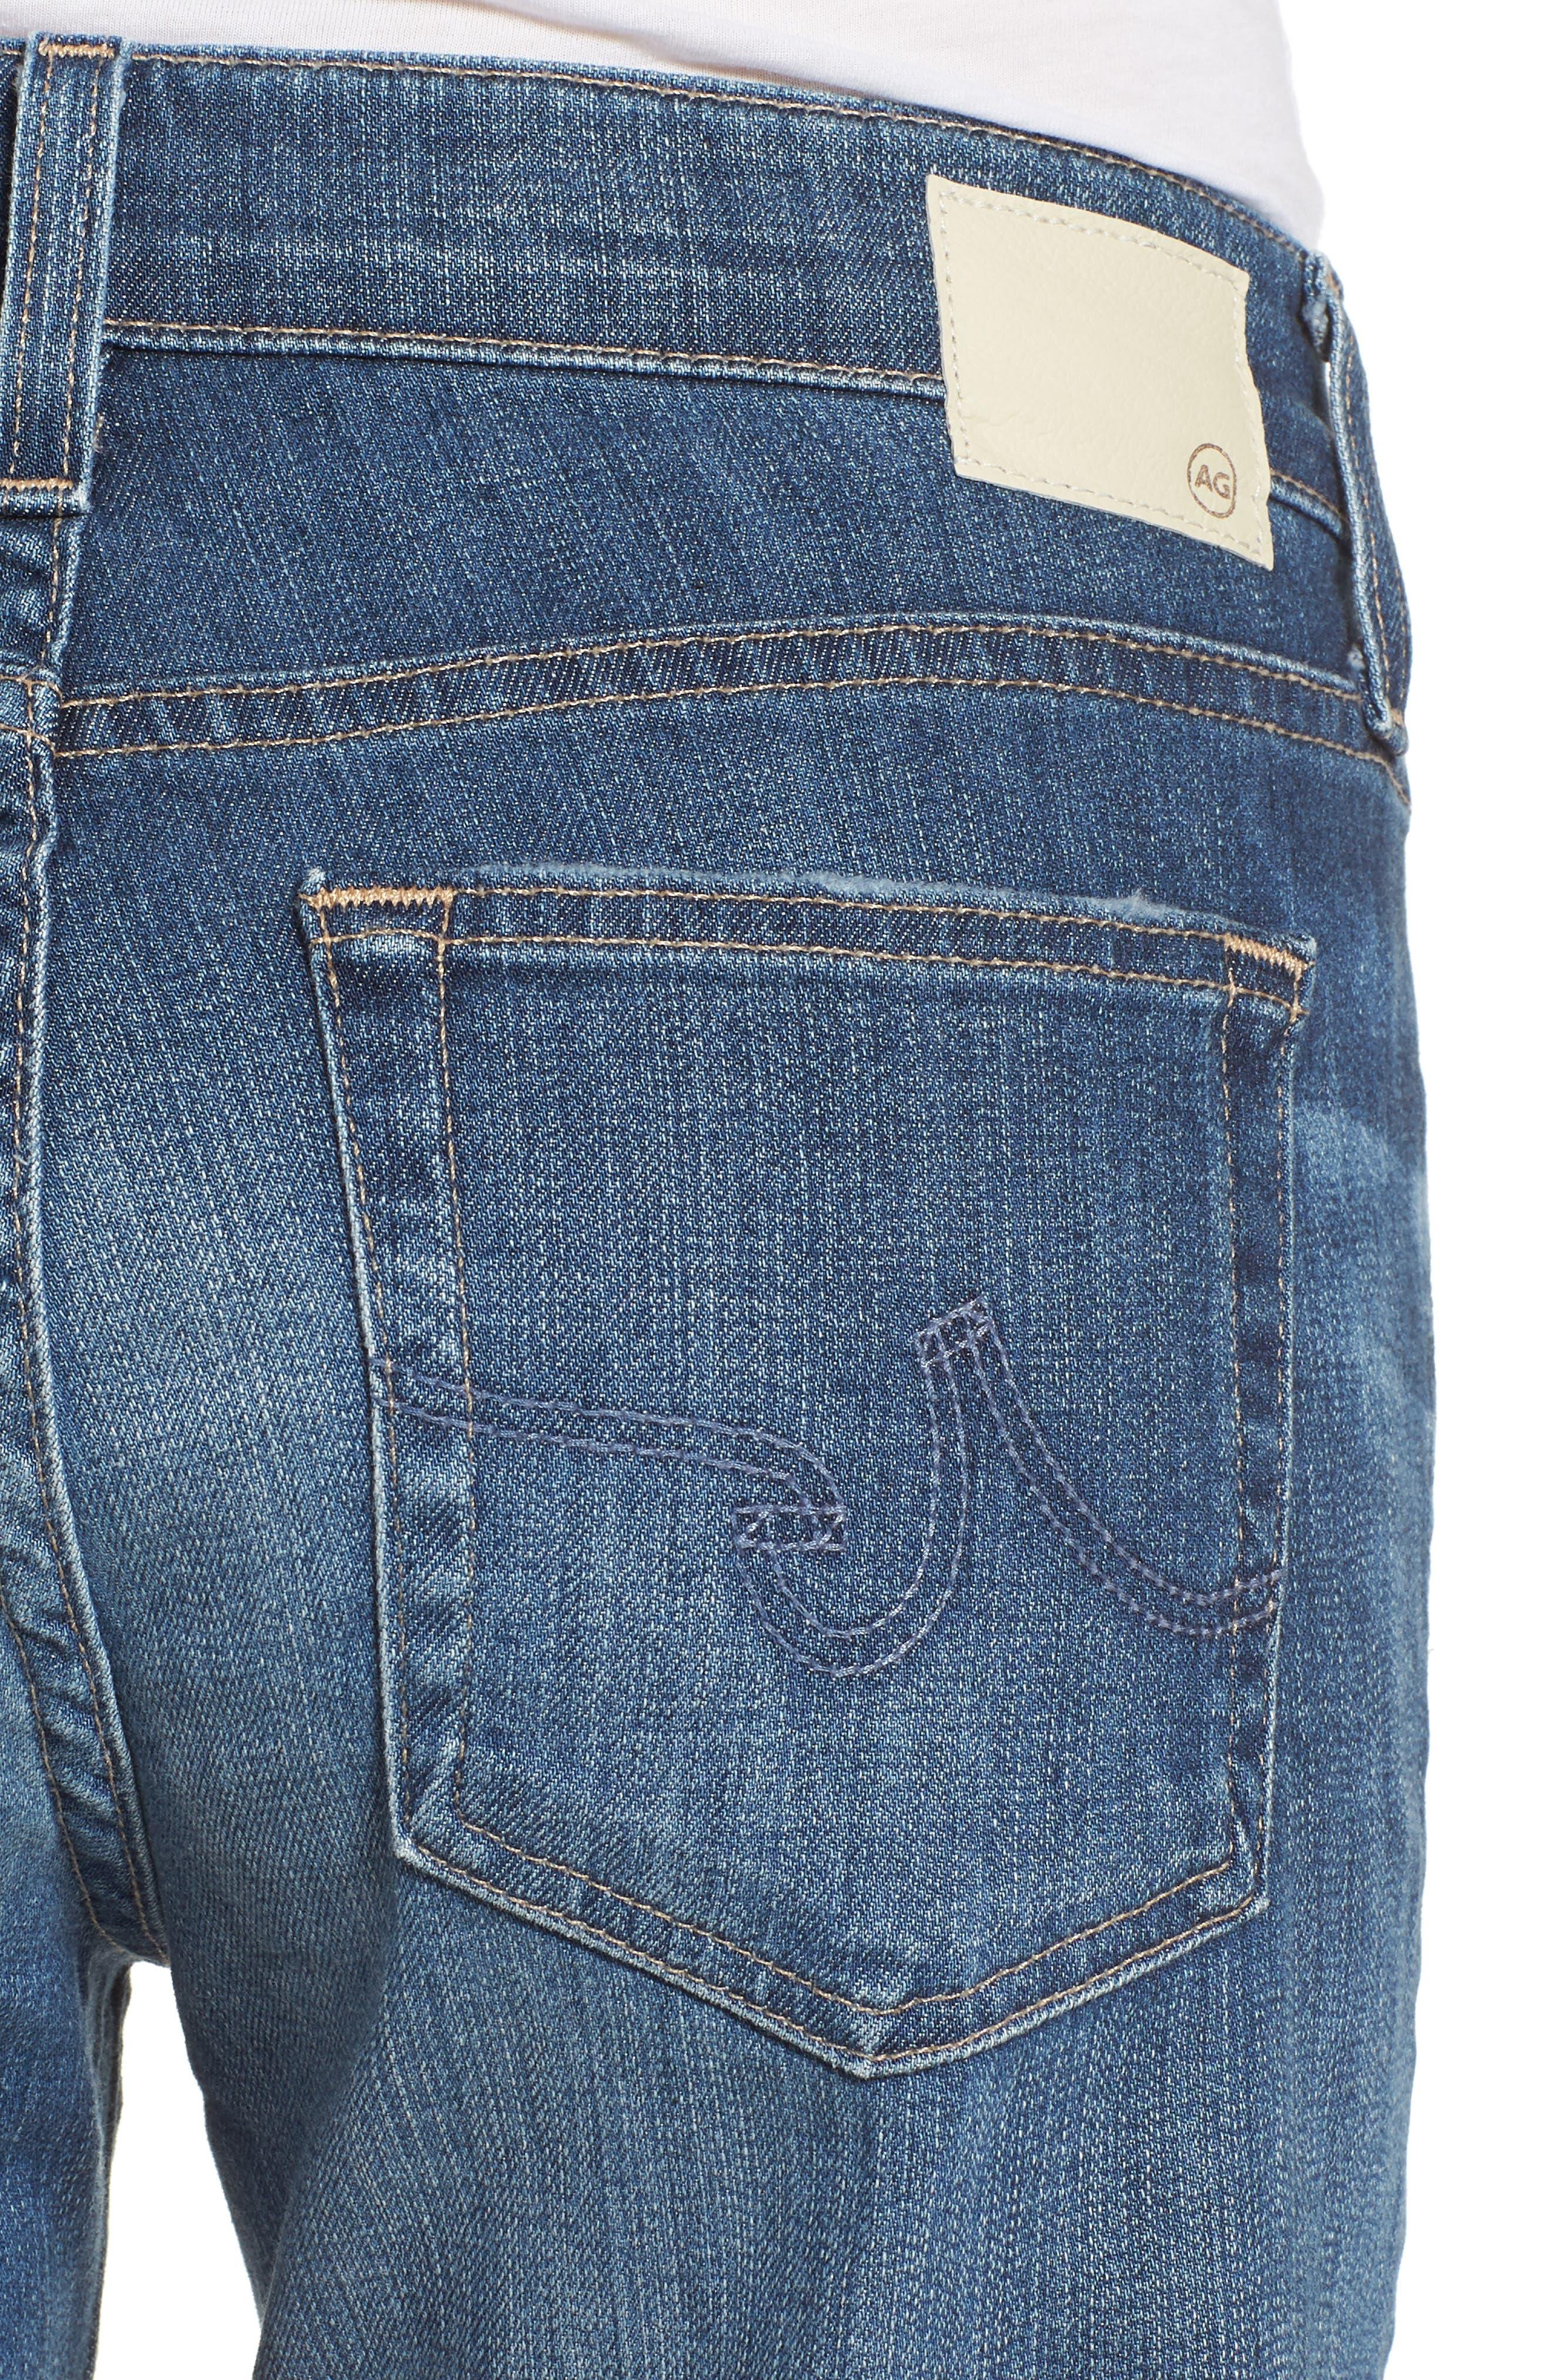 'Nikki' Distressed Denim Bermuda Shorts,                             Alternate thumbnail 4, color,                             11 Years Sapphire Sky